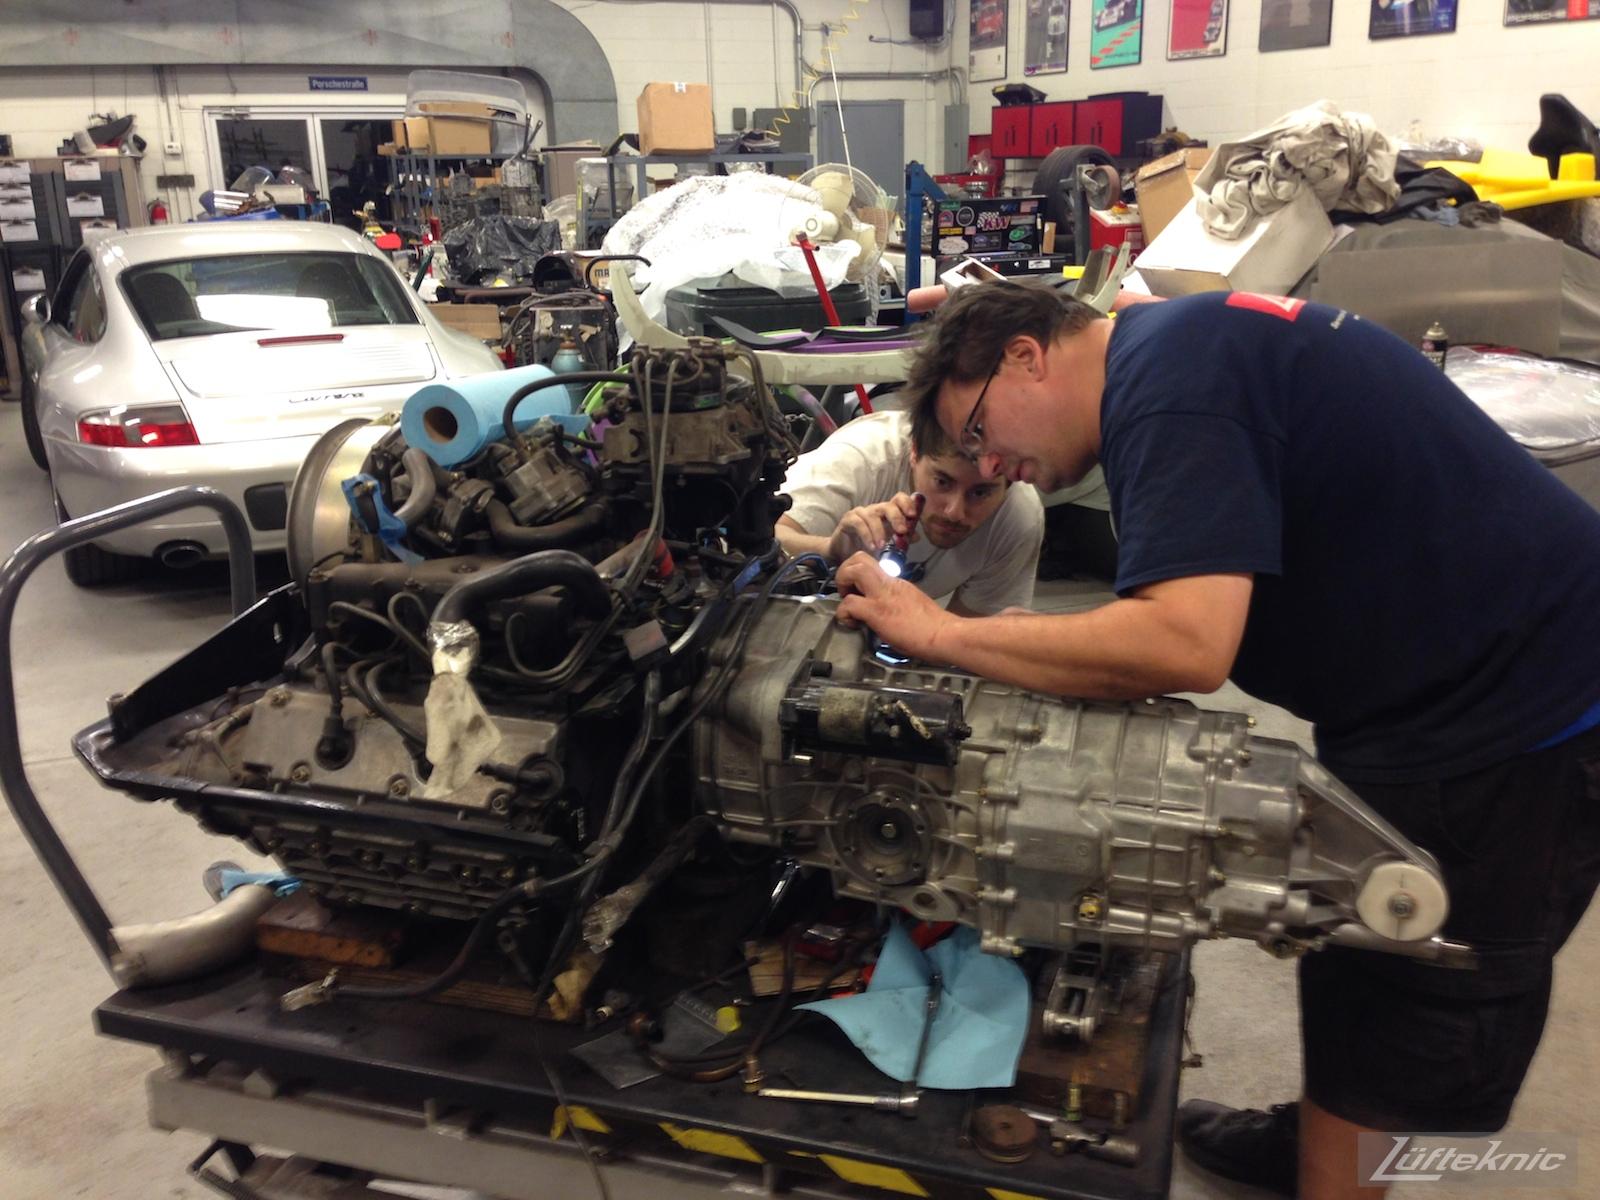 Lüfteknic #projectstuka Porsche 930 Turbo bellhousing inspection